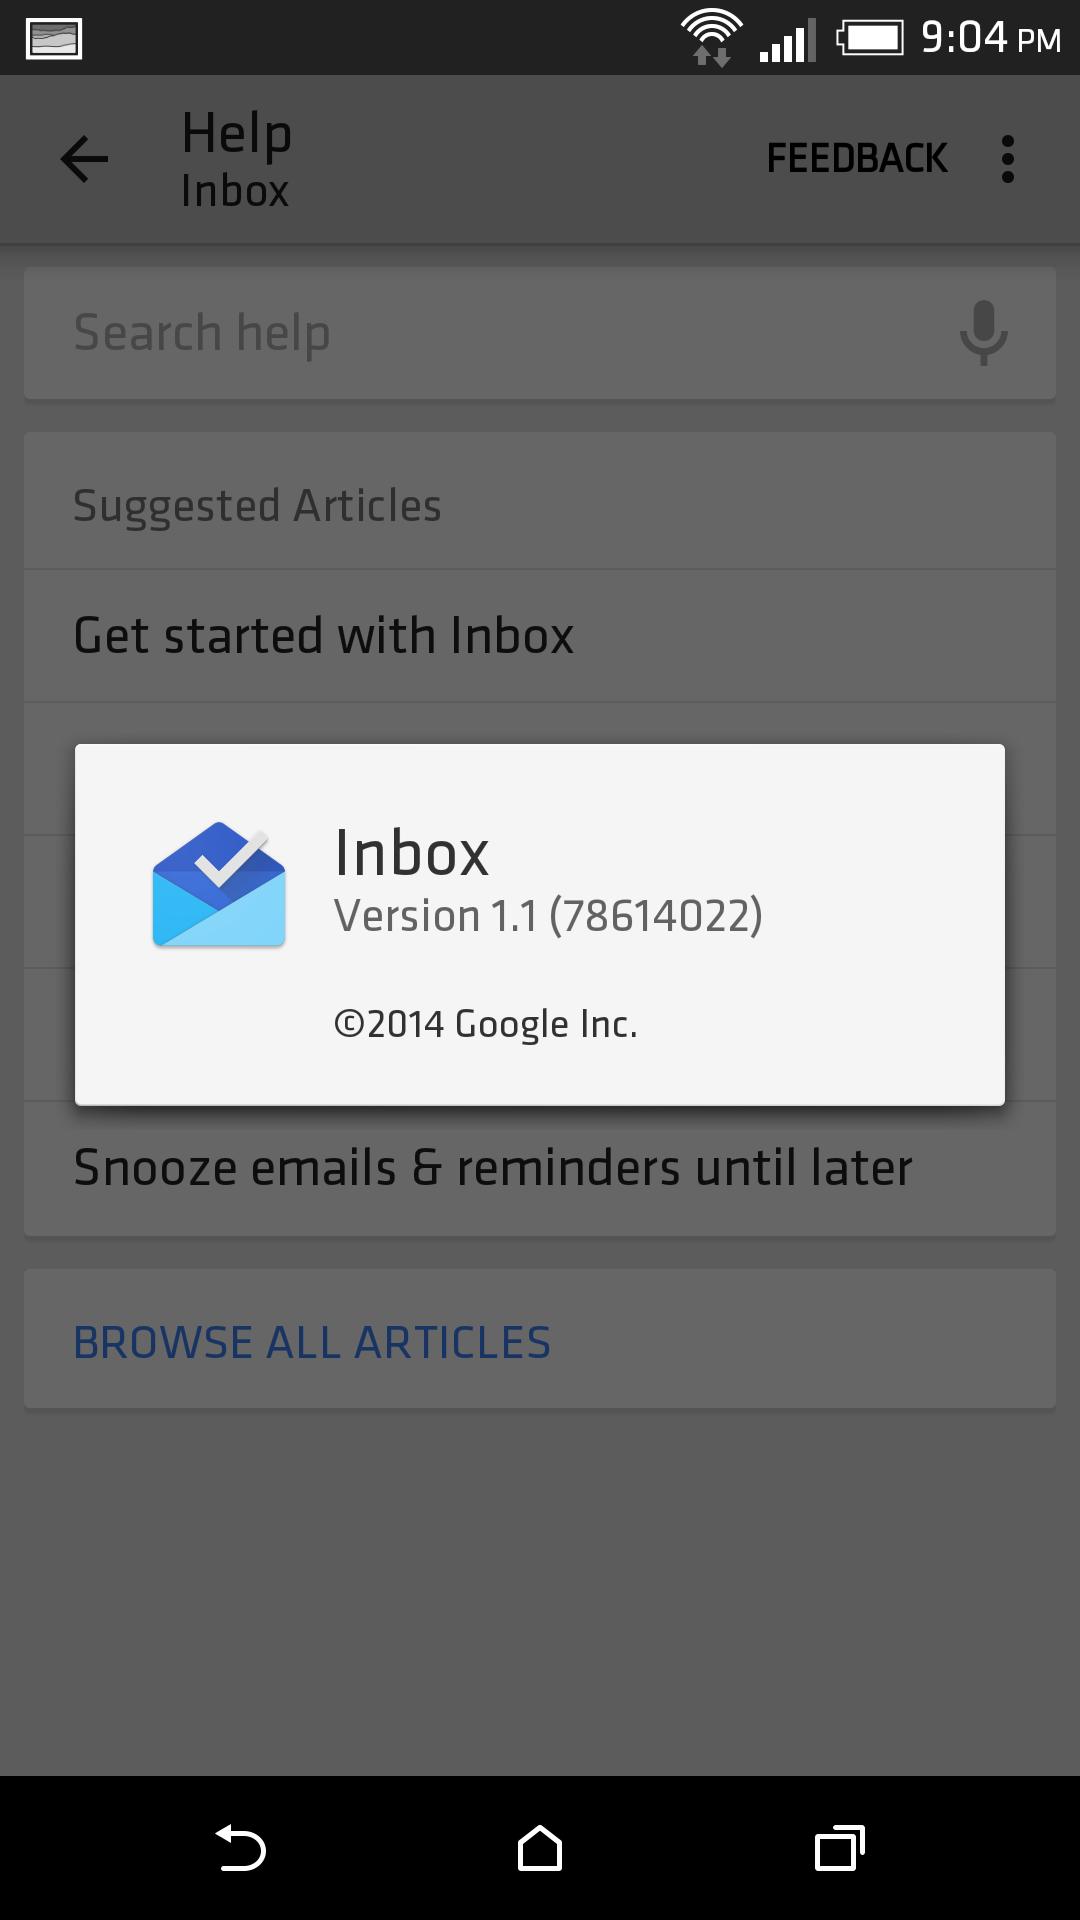 inbox 1.1